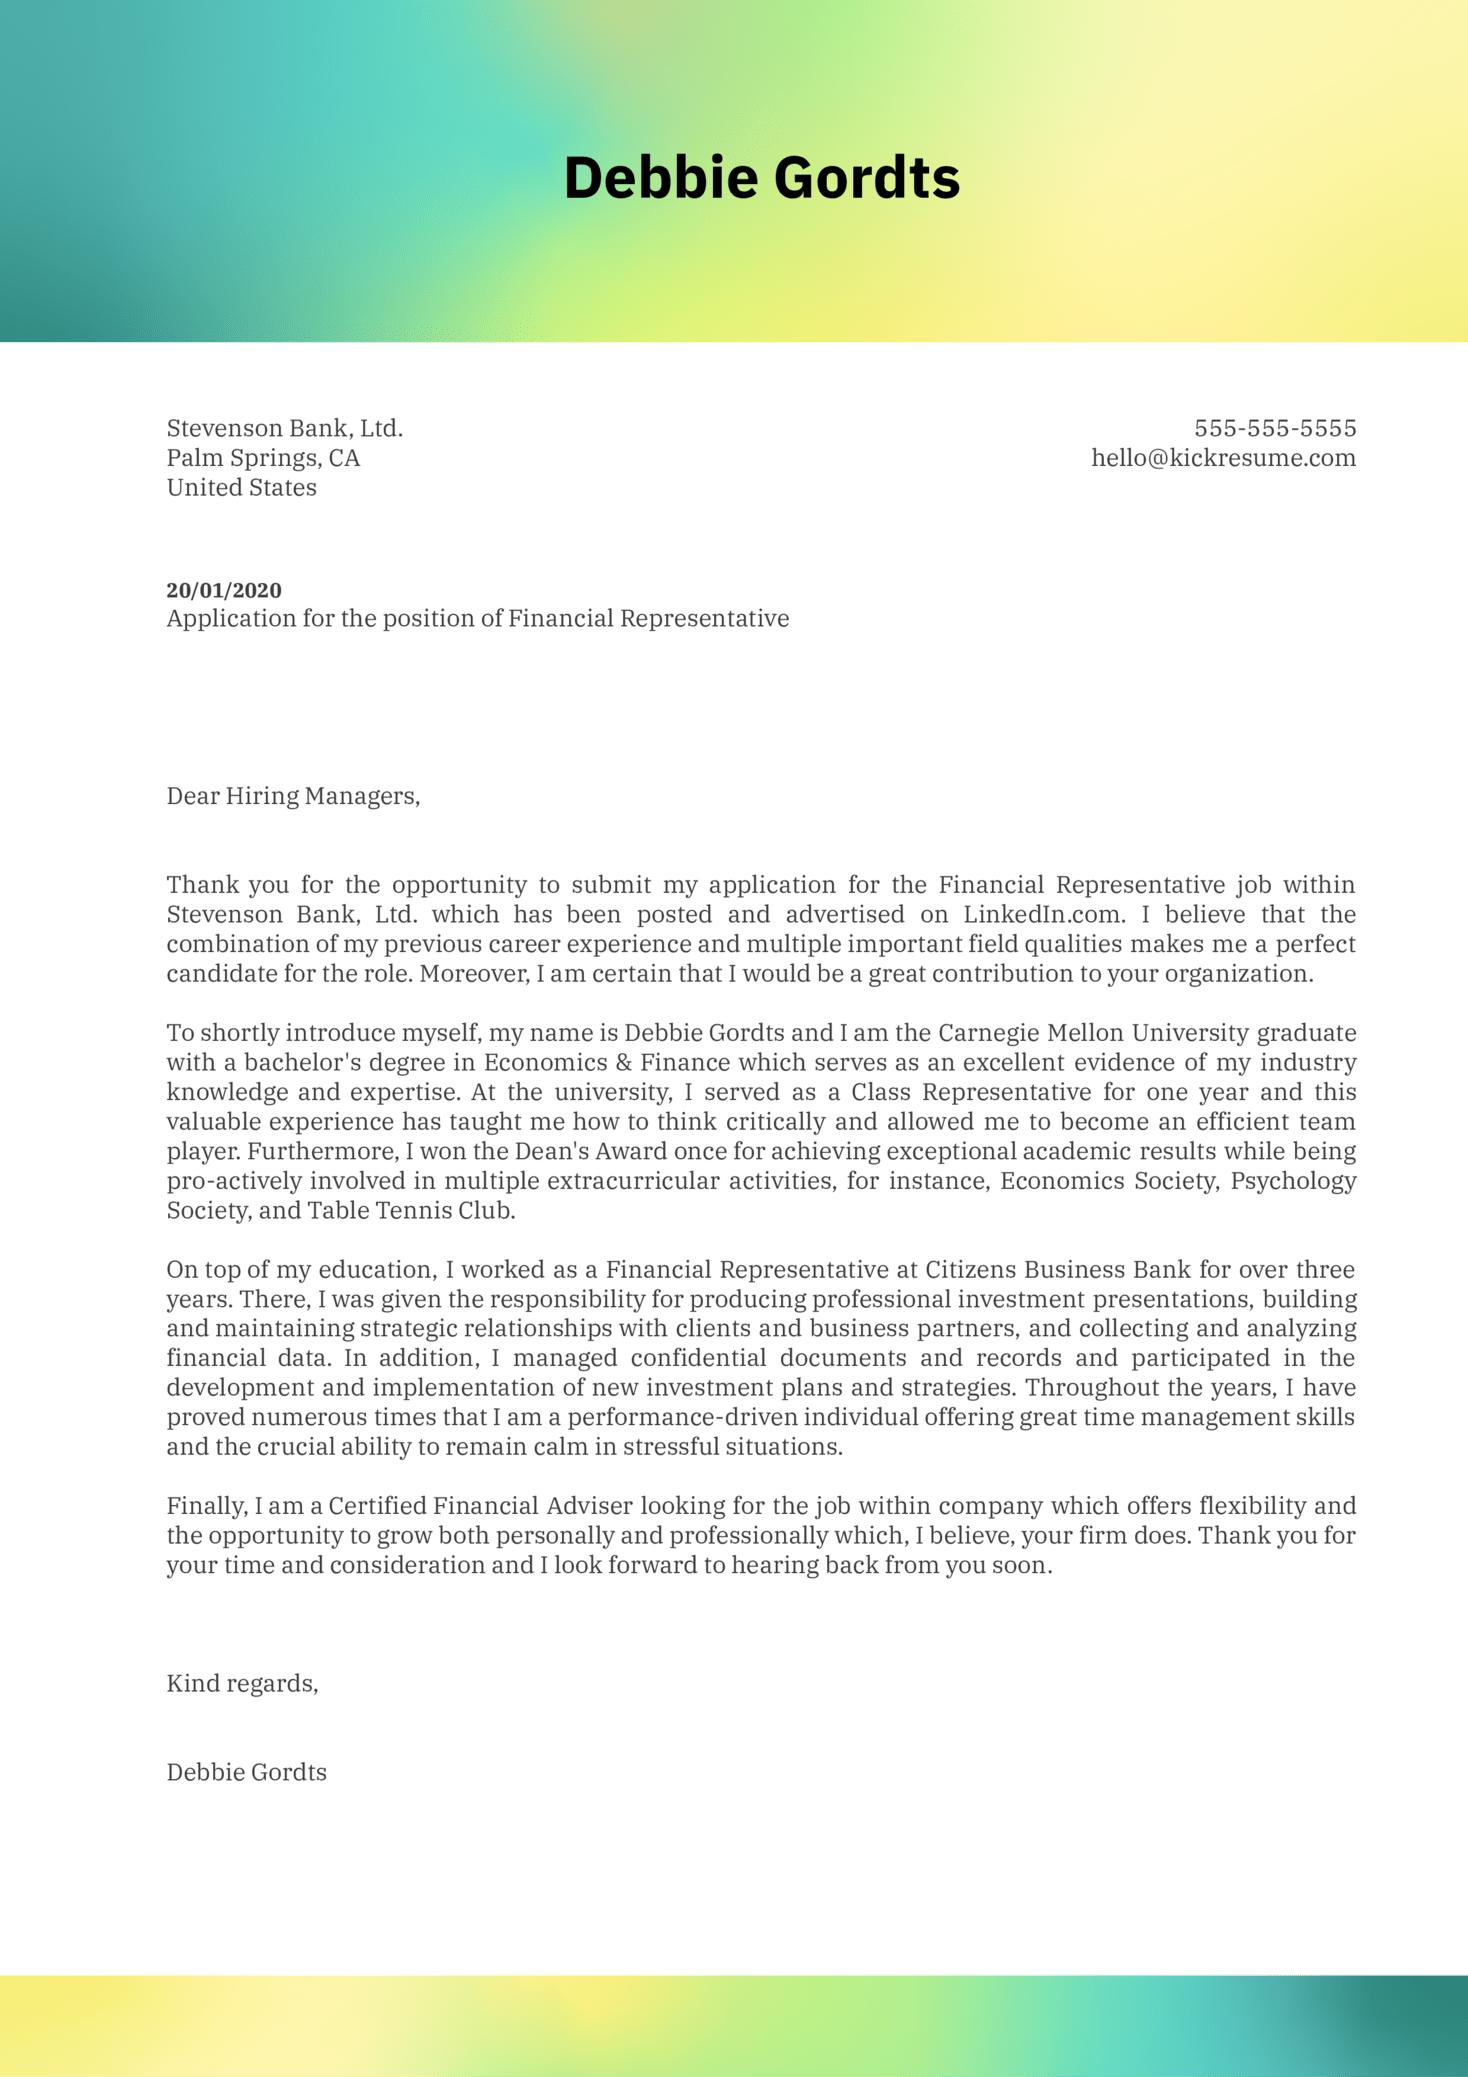 Financial Representative Cover Letter Sample